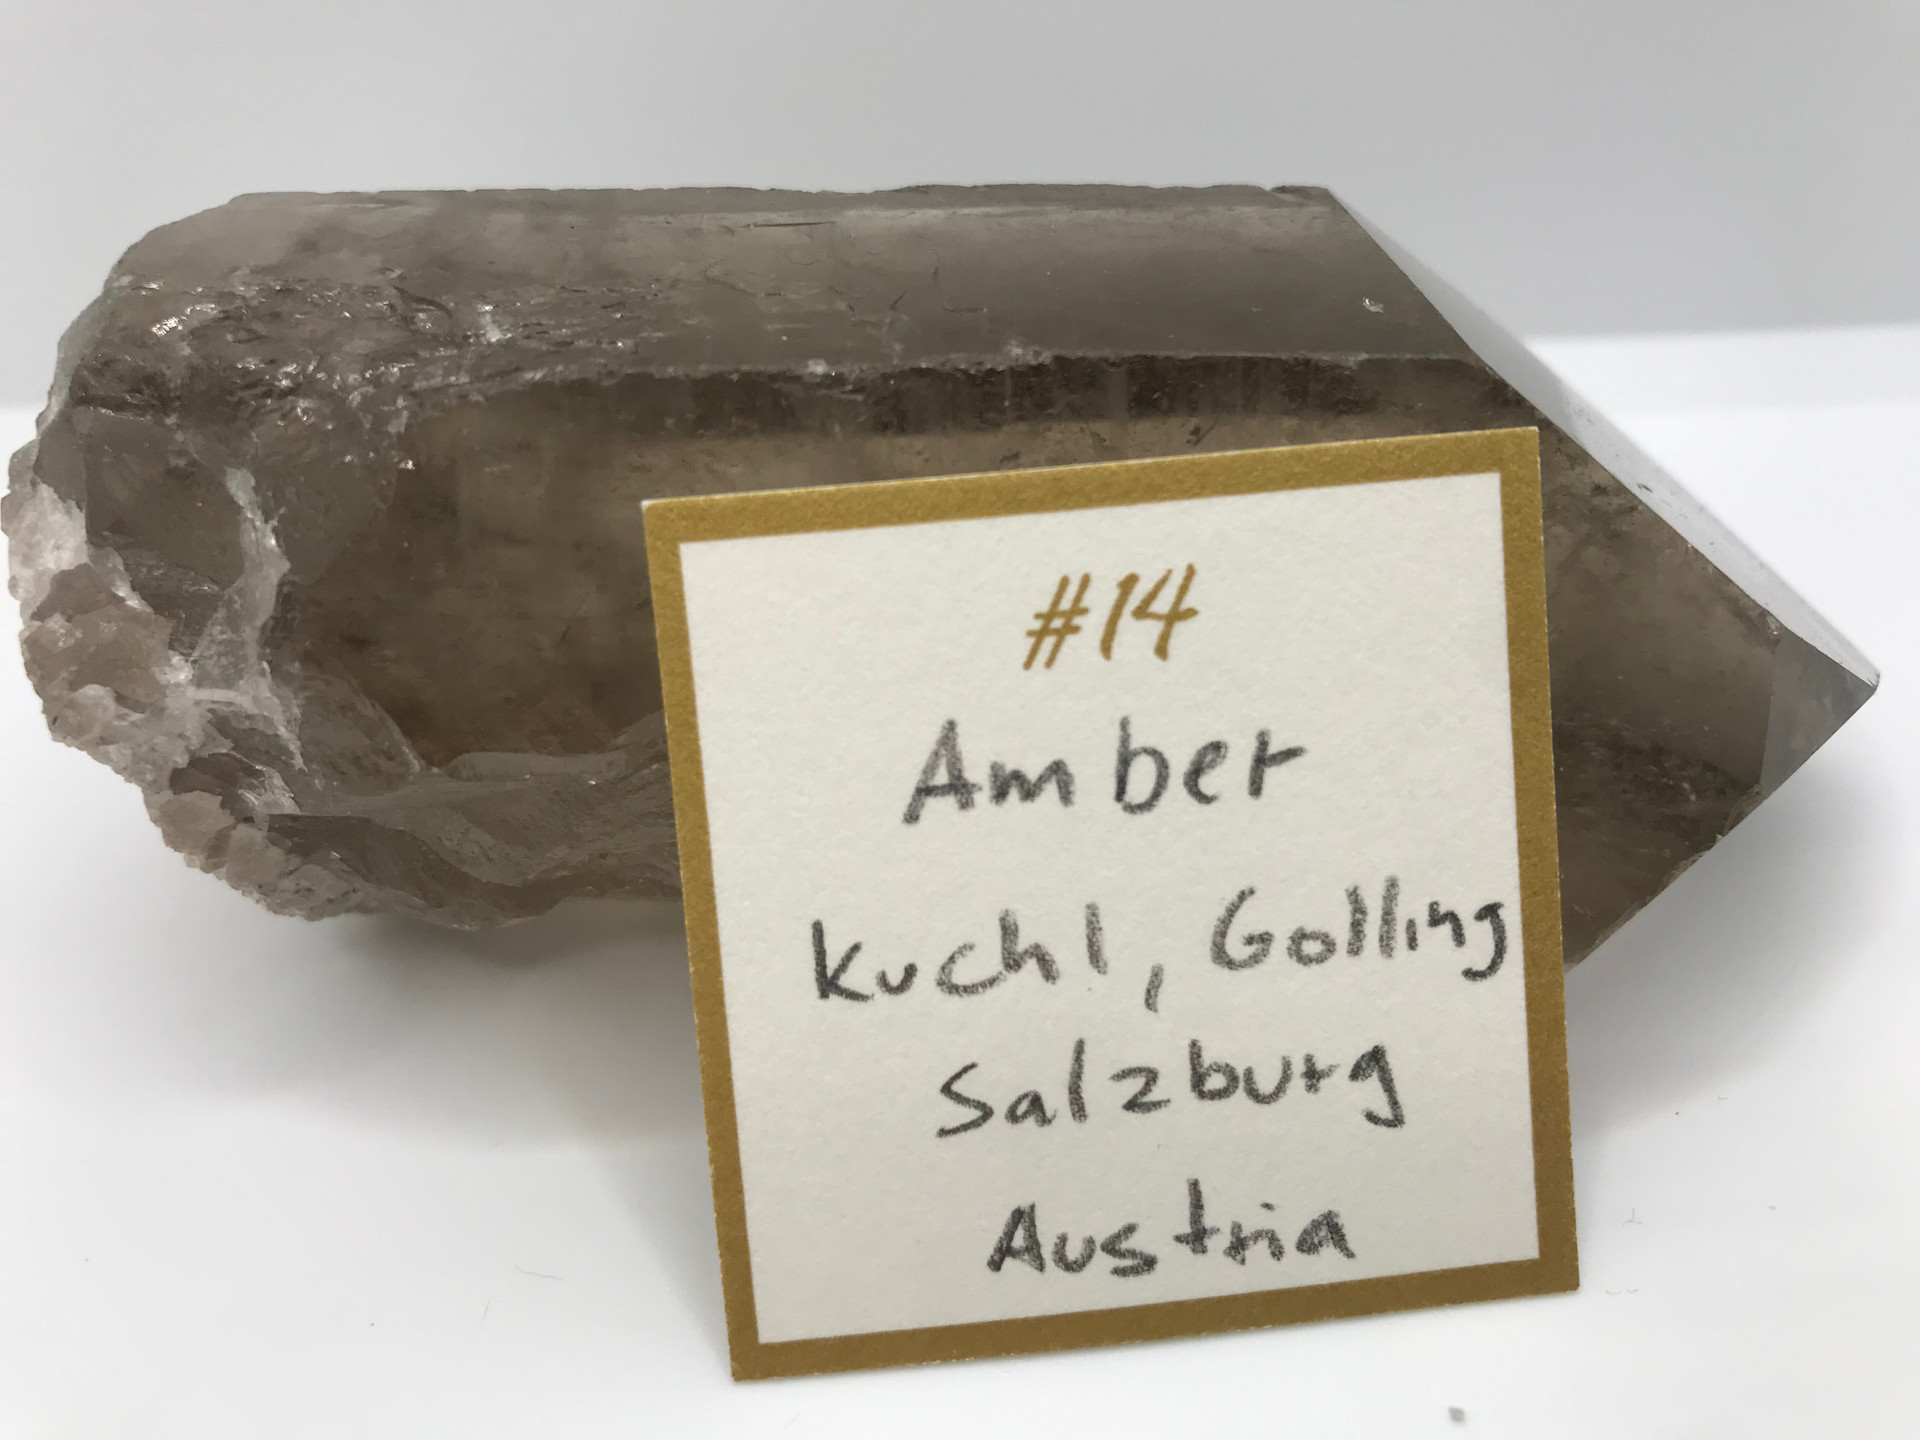 Amber Crystal Ring (origin)